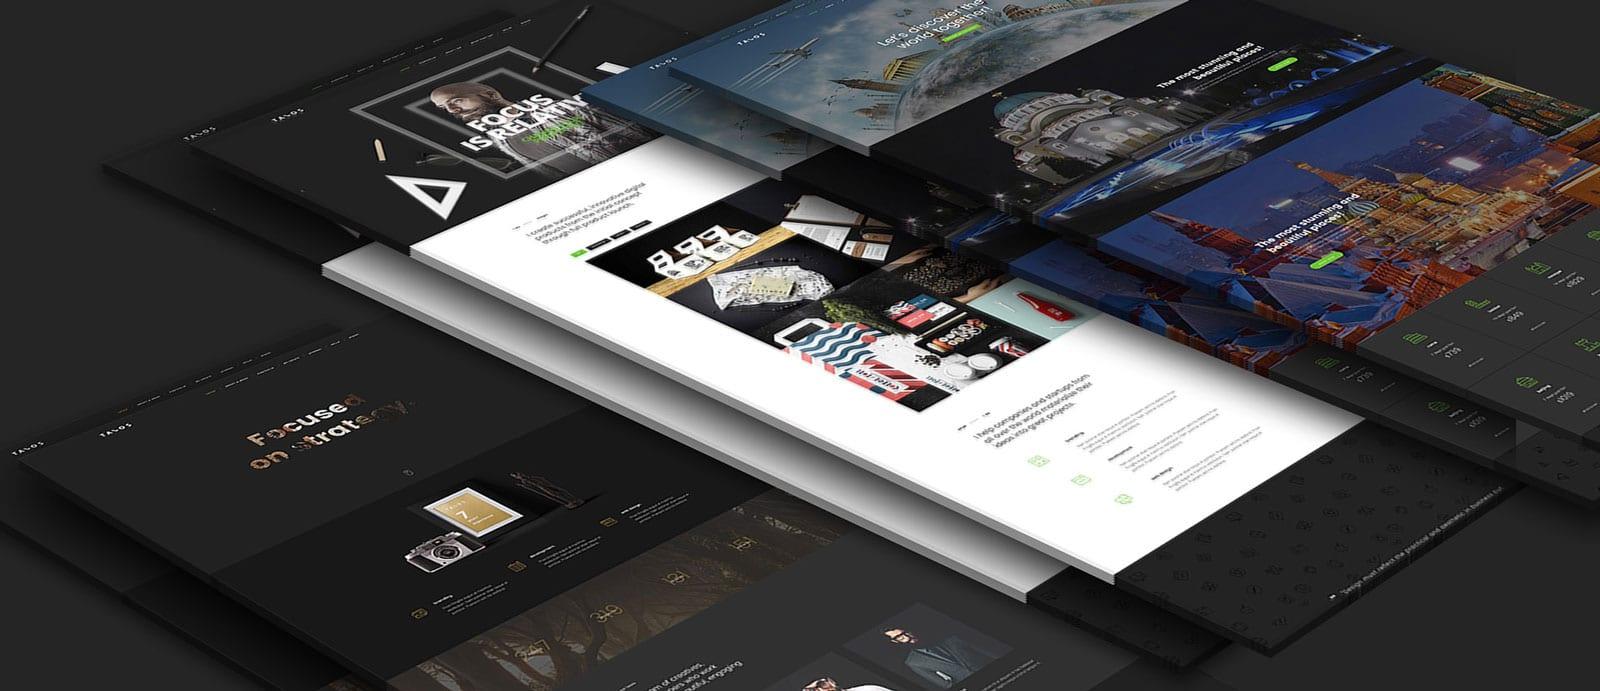 web design professional wordpress - seo - sem - website design - allen tx